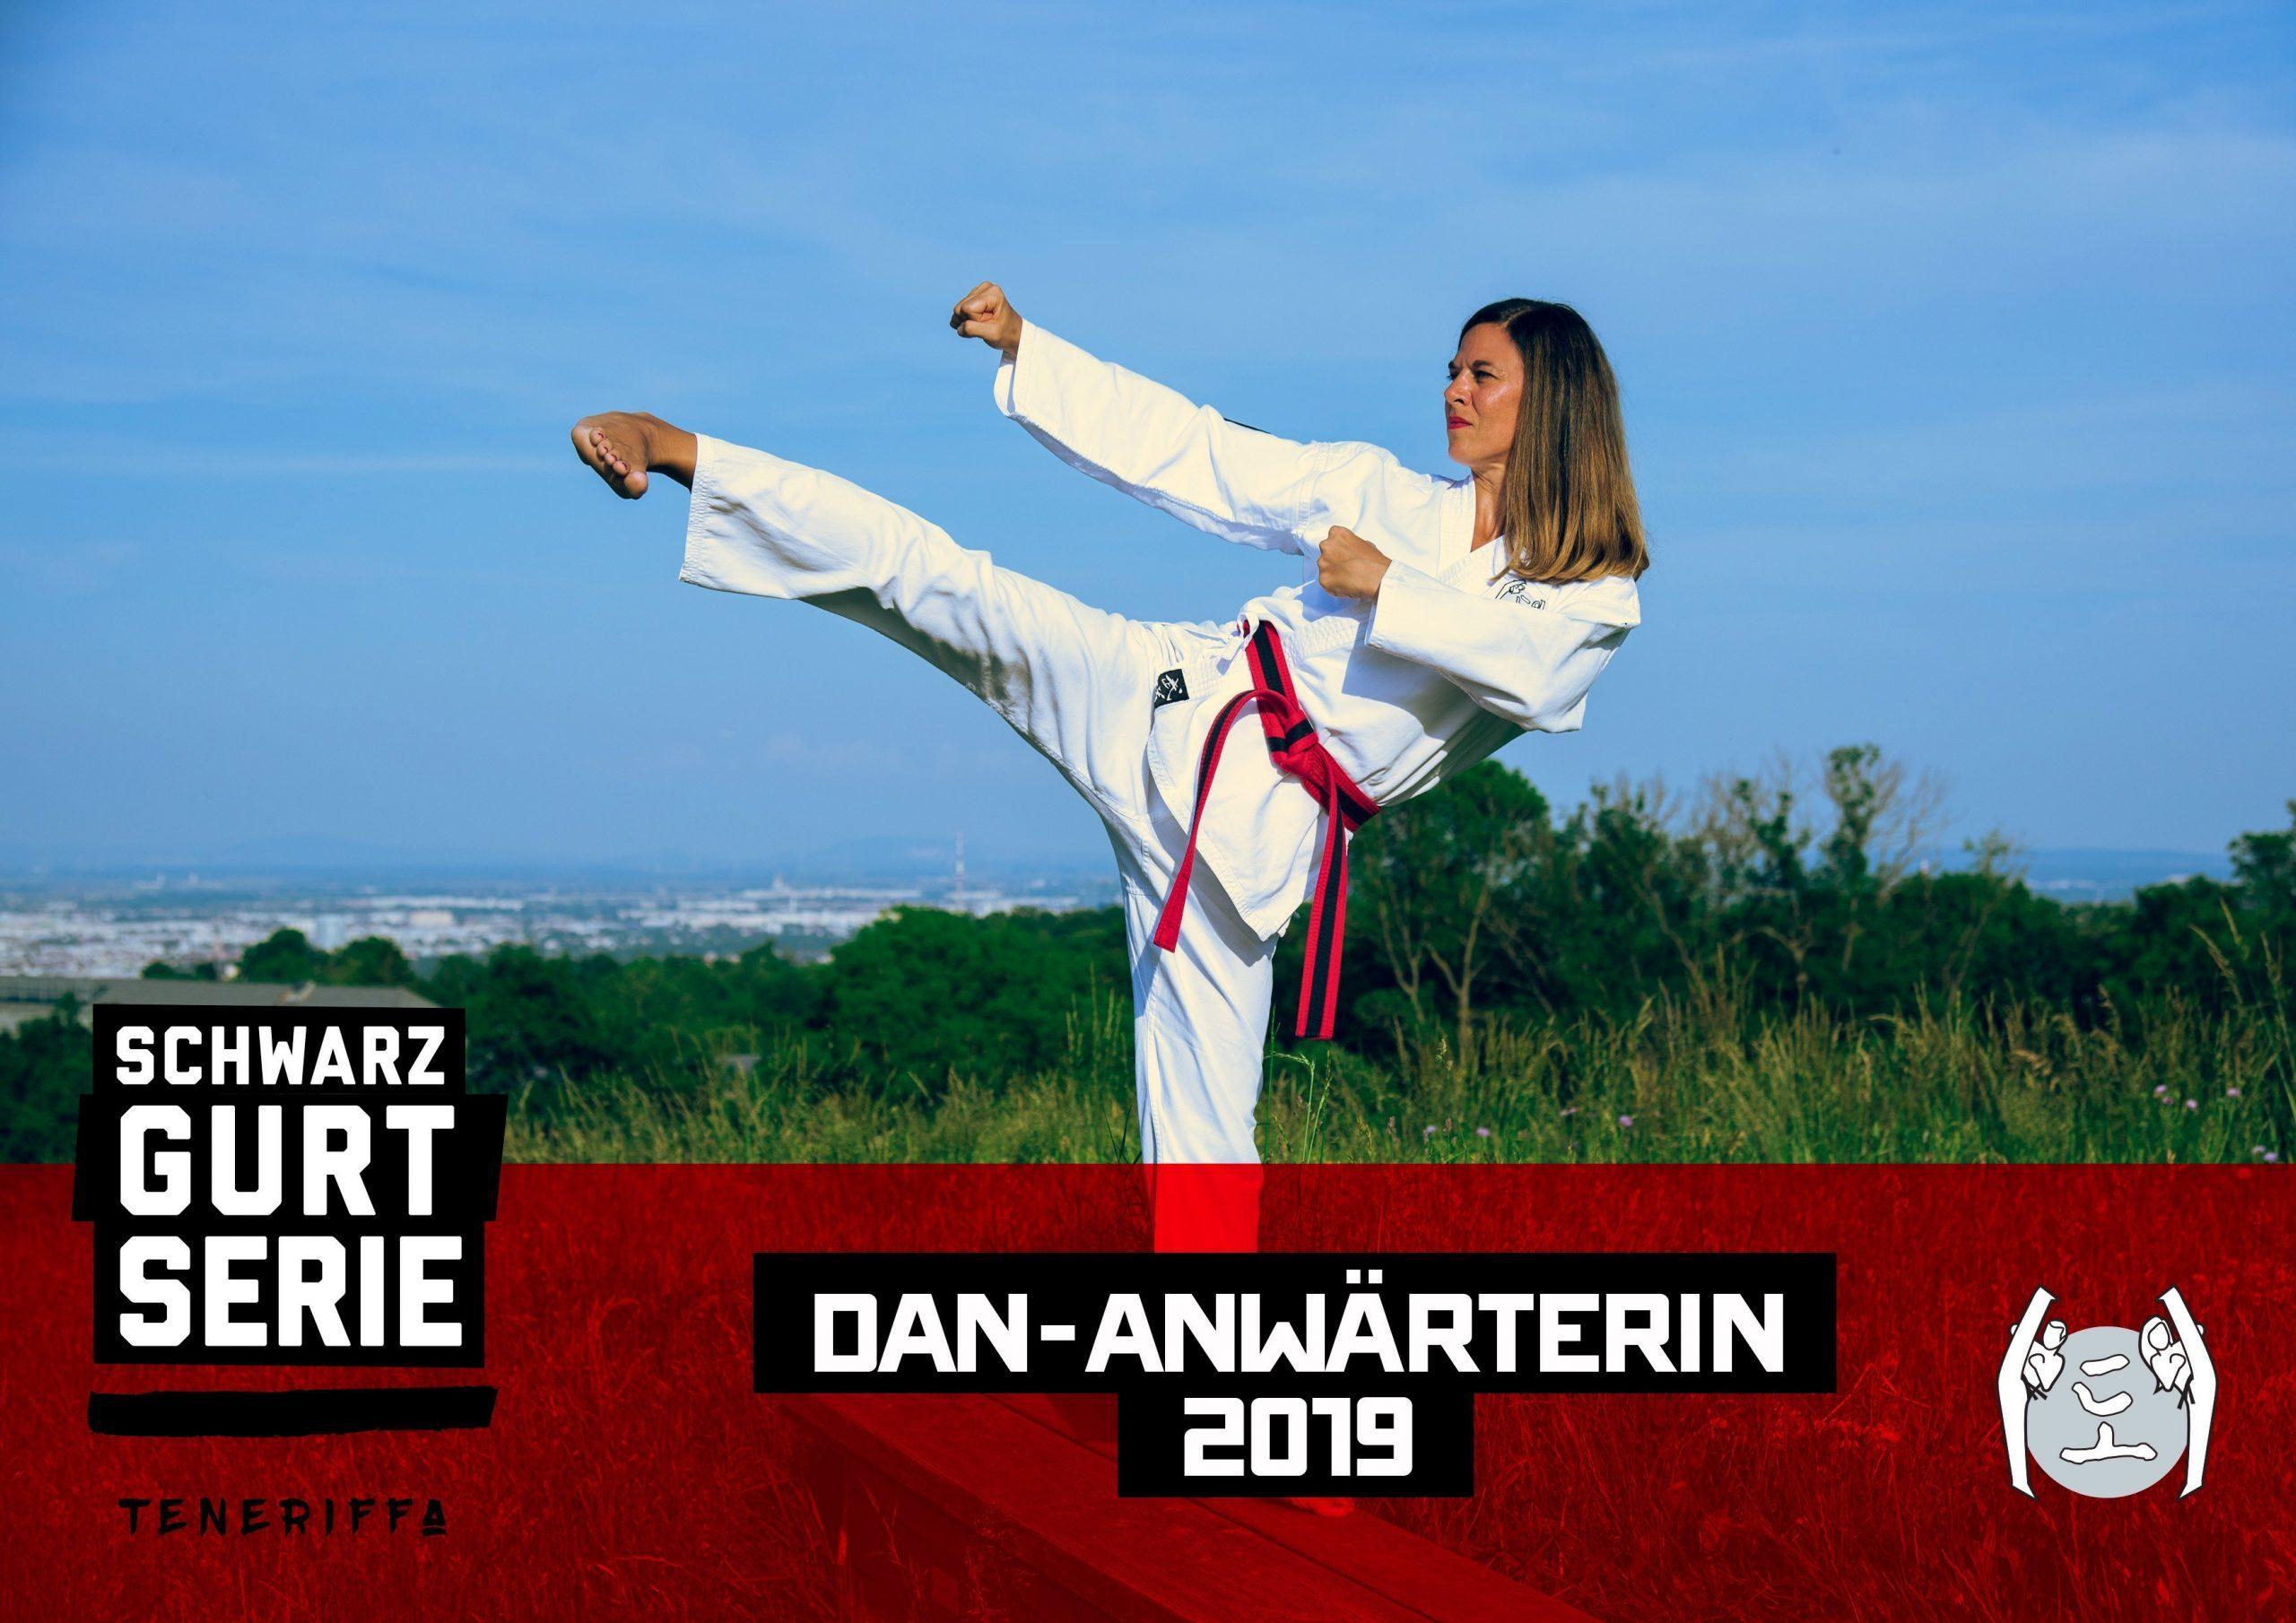 YOUNG-UNG Taekwondo Schwarzgurt Prüfung Astrid Rauch Teneriffa